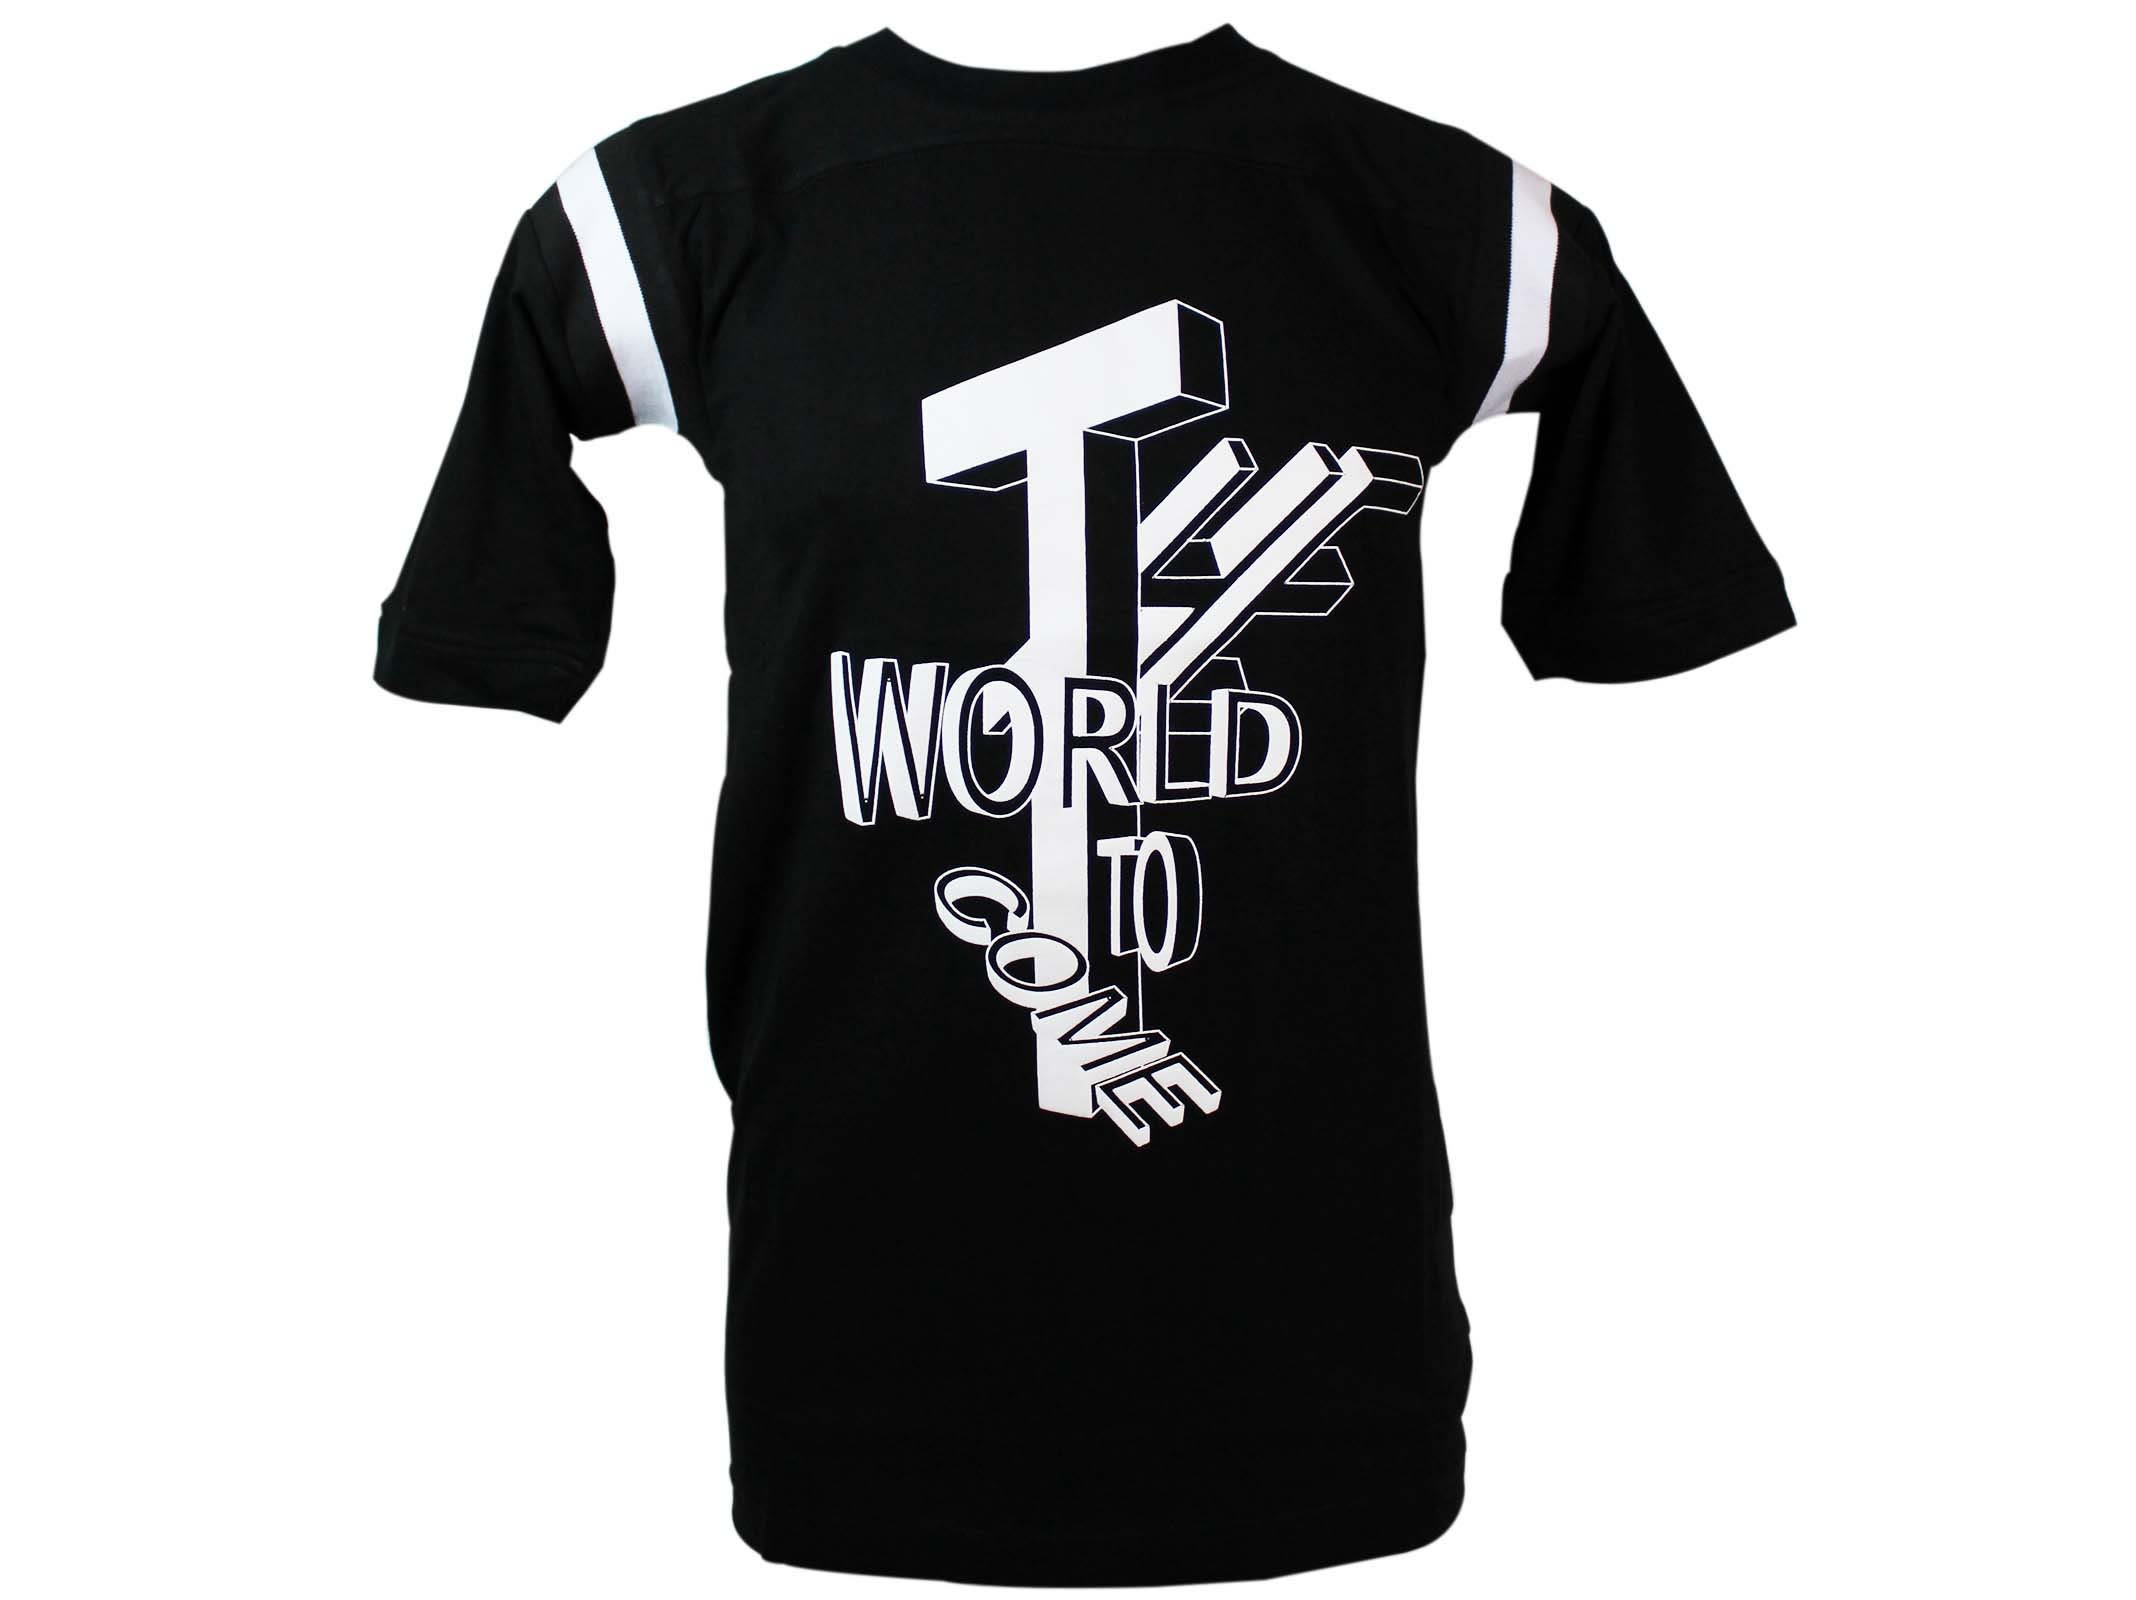 Ktz Black The World Printed T-shirt